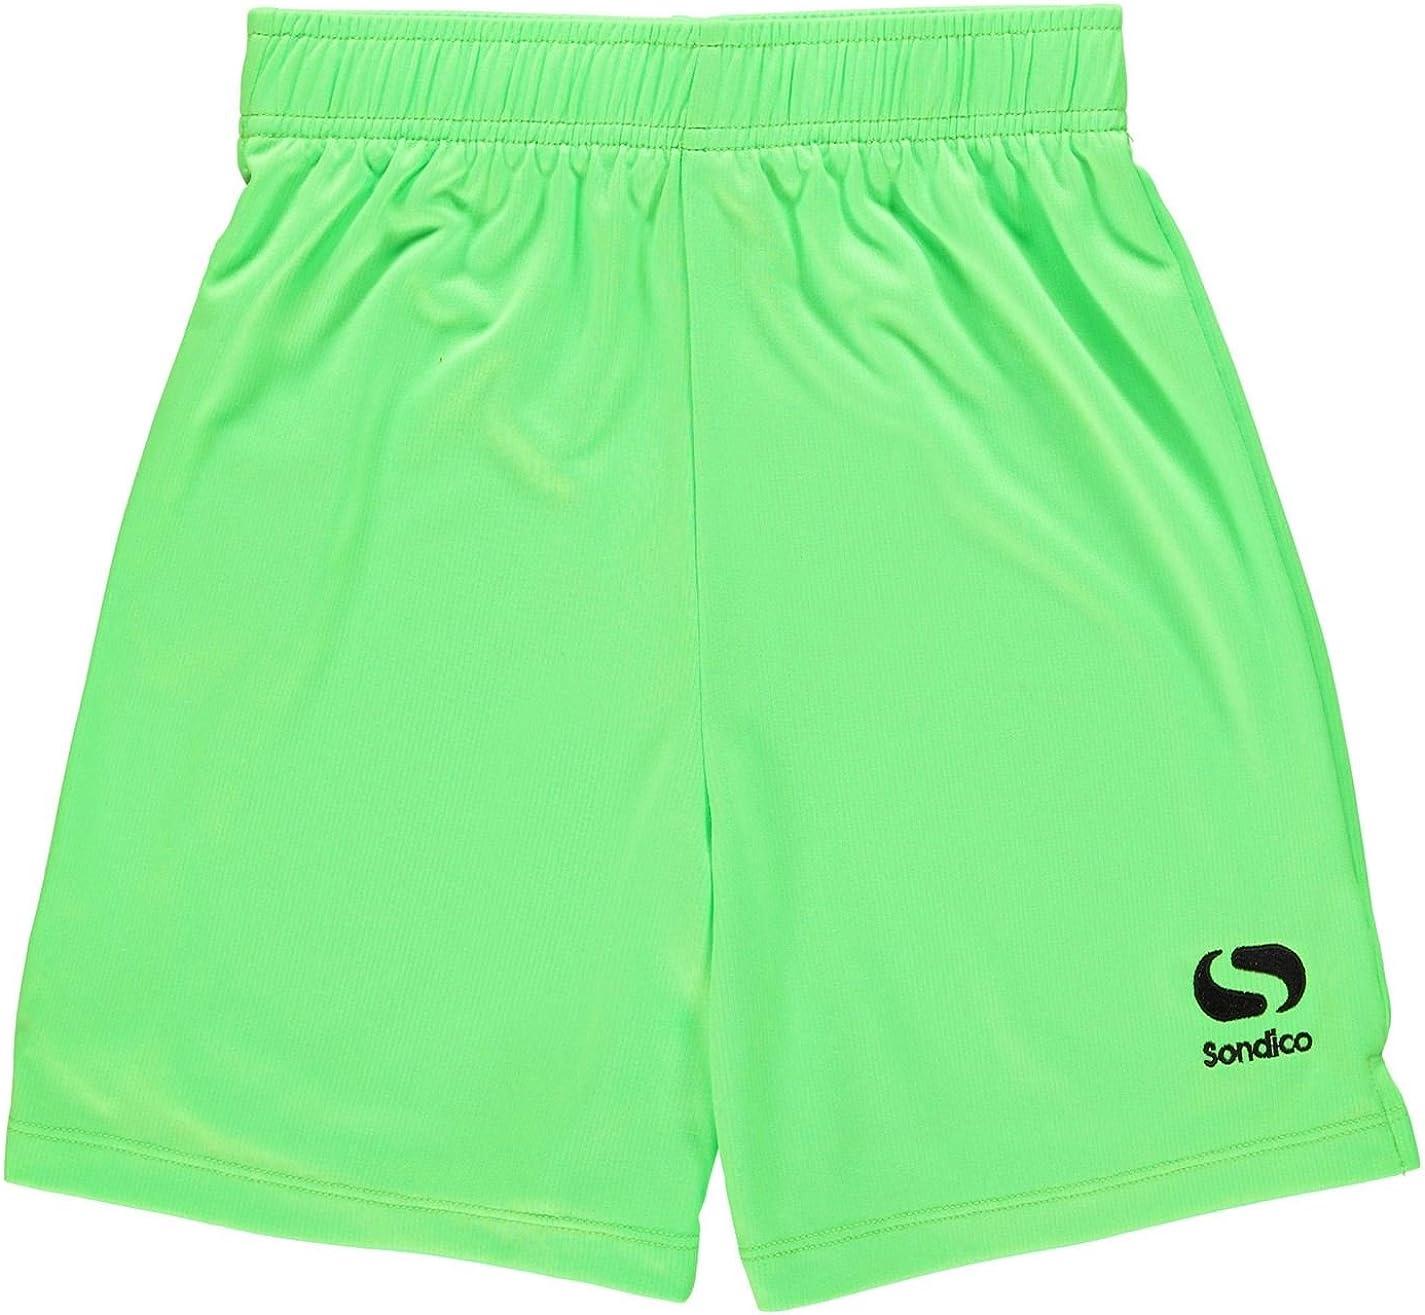 XLB Sondico Kids Boys Core Football Shorts Junior Pants Trousers Bottoms Breathable FluGreen//Black 13